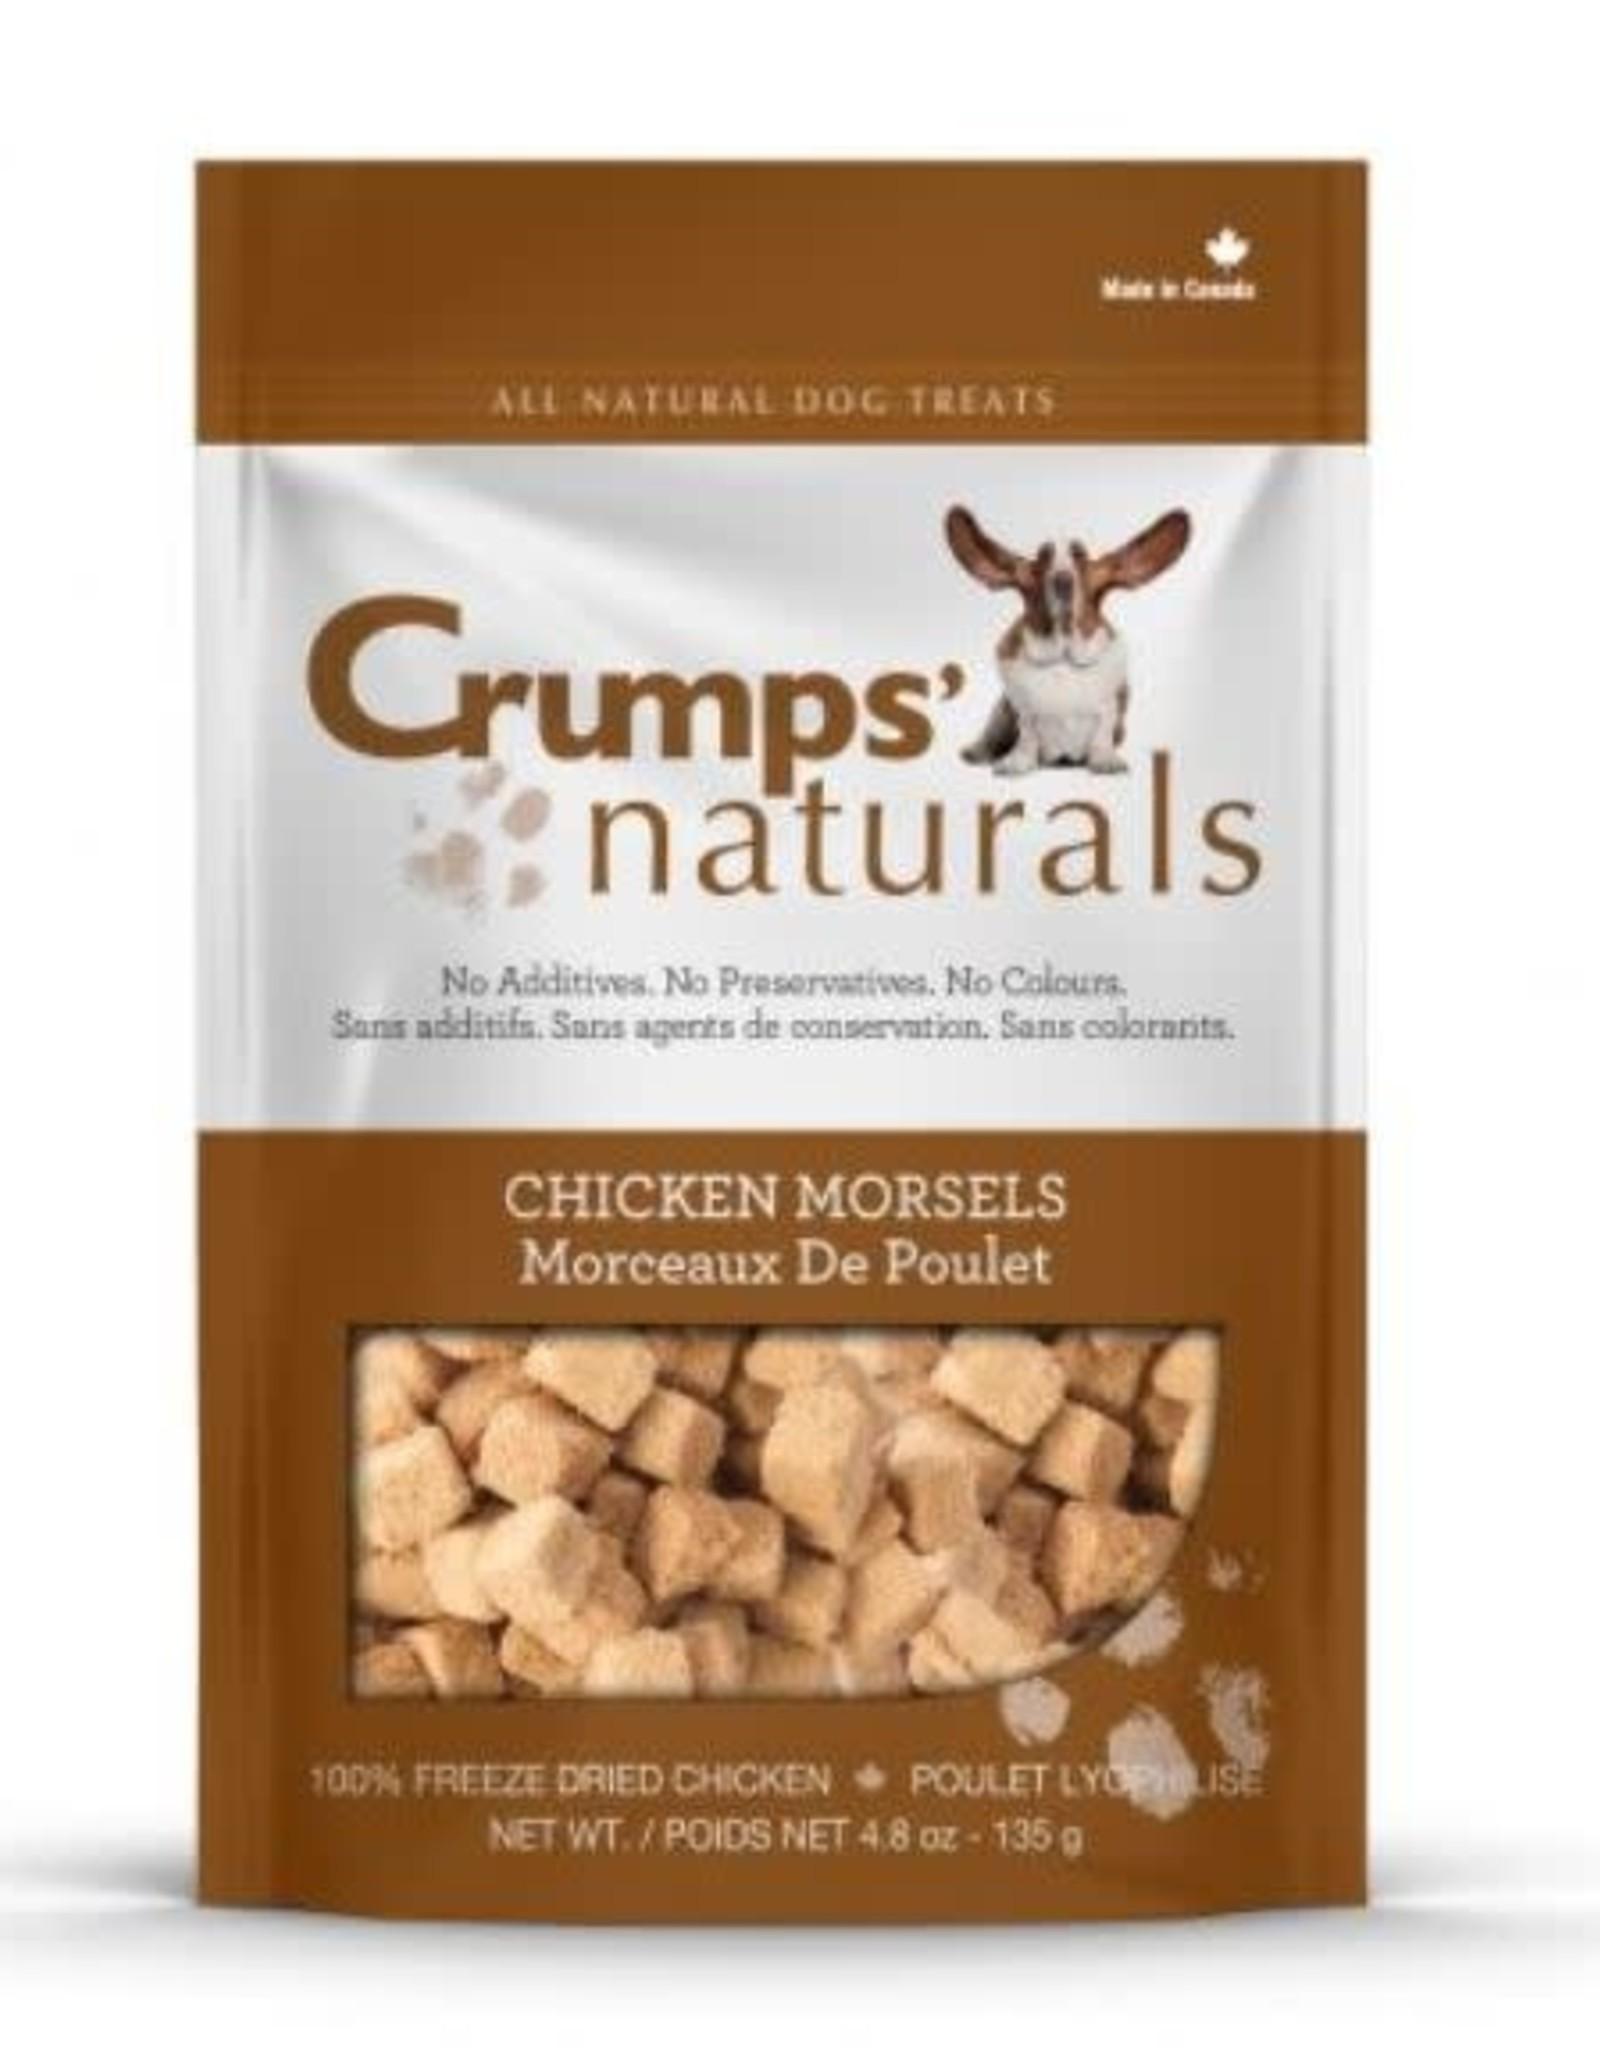 Crumps Natural Crumps' Naturals Chicken Morsels - 65g